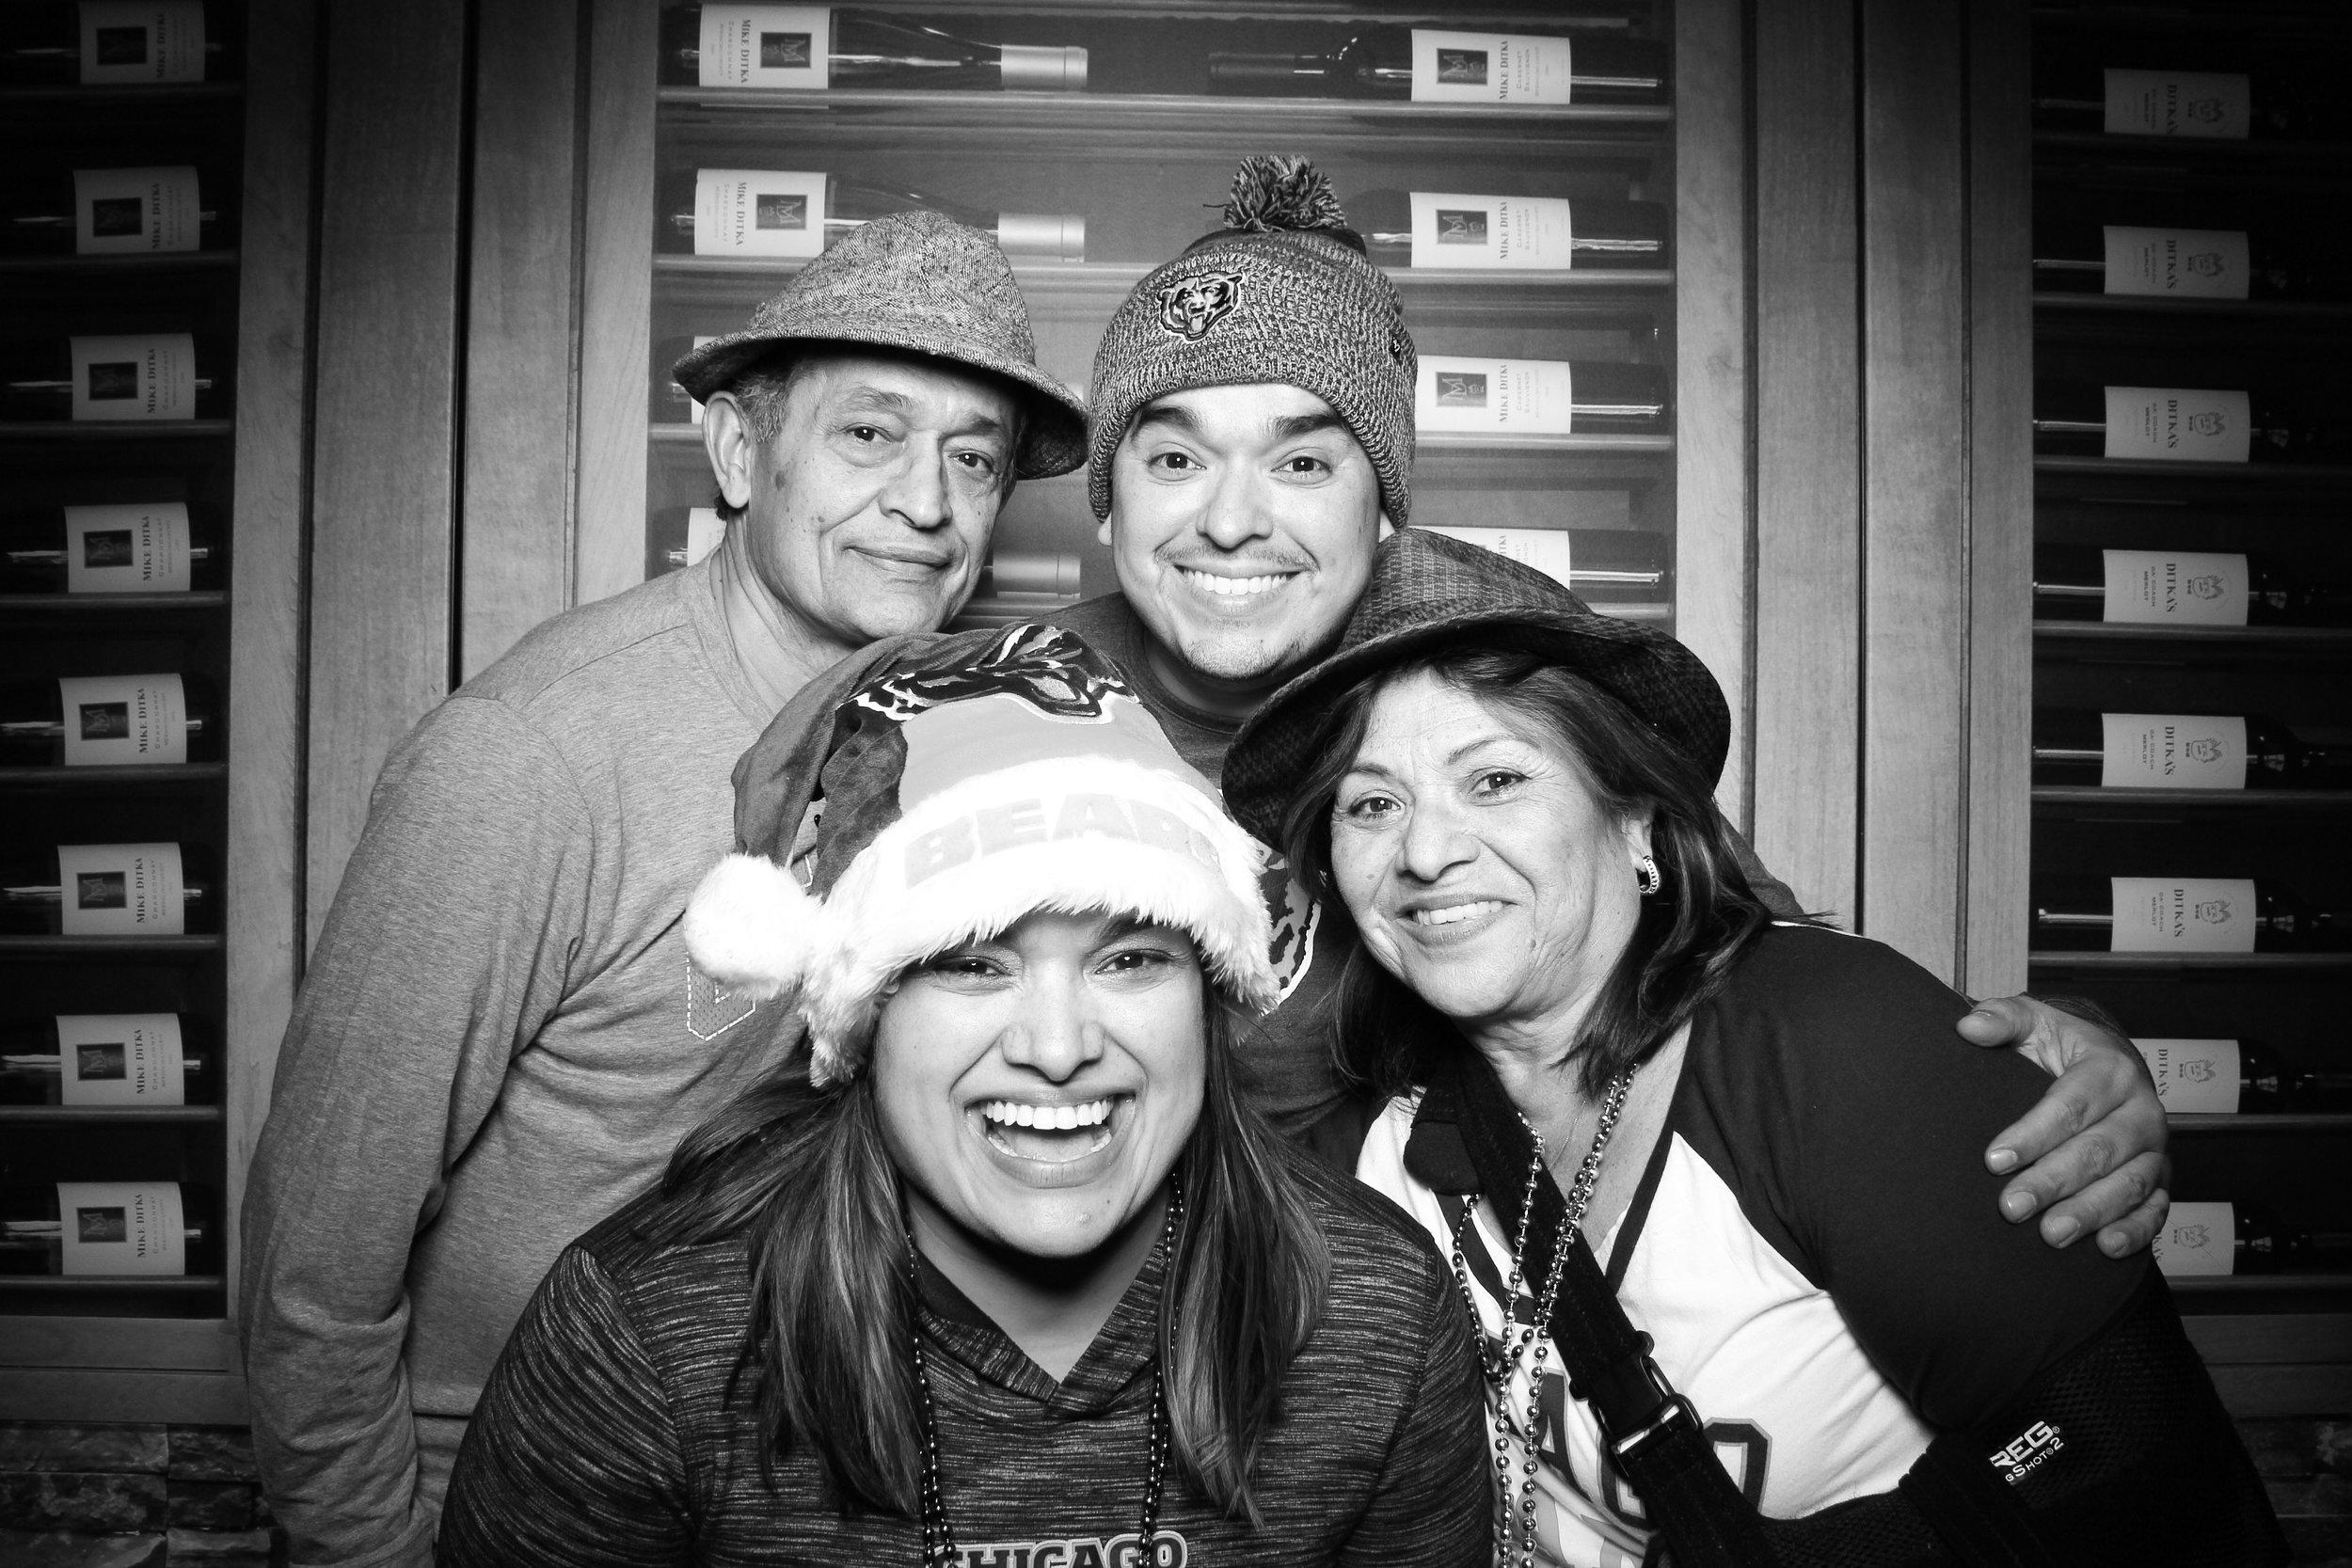 Chicago_Vintage_Photobooth_Ditkas_Birthday_Party_13.jpg